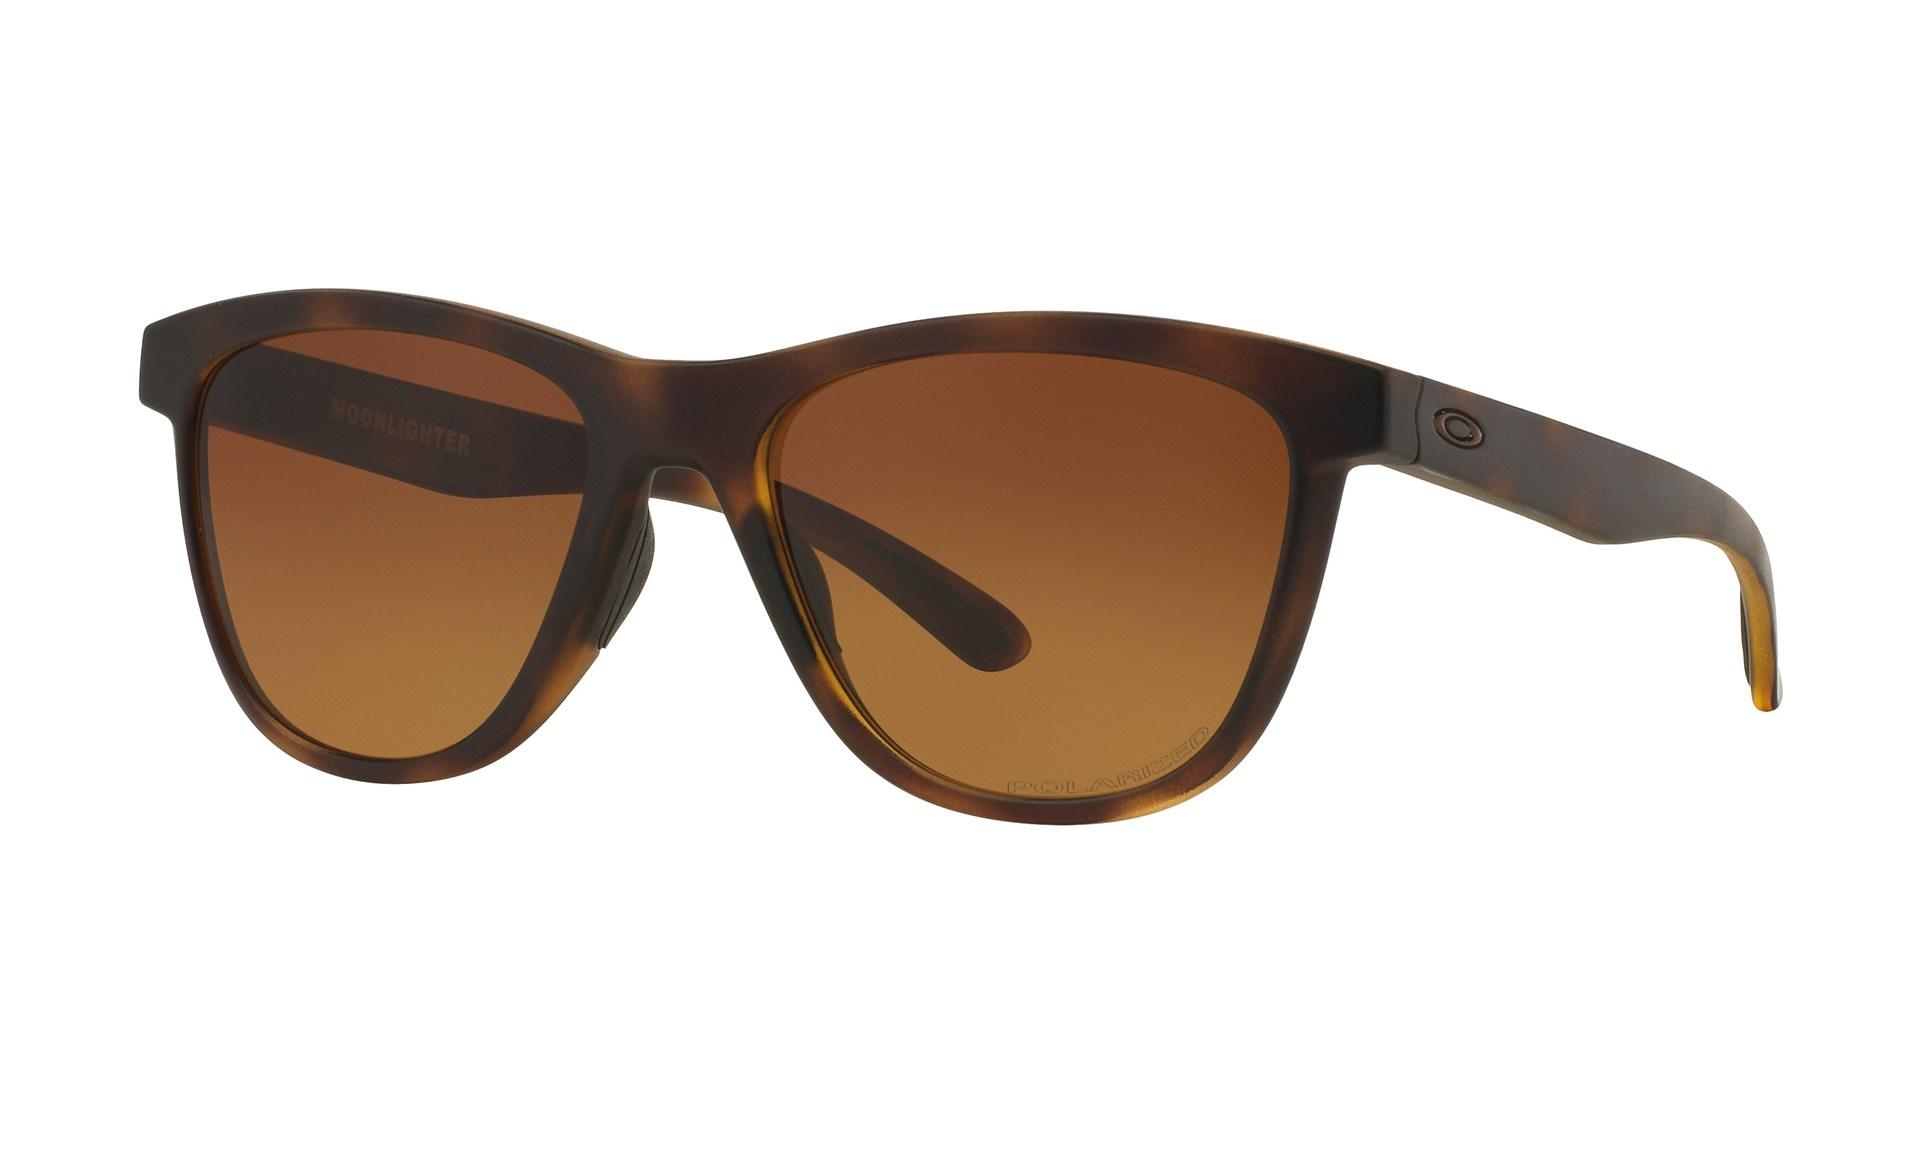 af03d587fd52 Bilde  Oakley Moonlighter Tortoise   Brown Gradient Polarized solbriller -  Tortoise   Brown Gradient Polarized ...